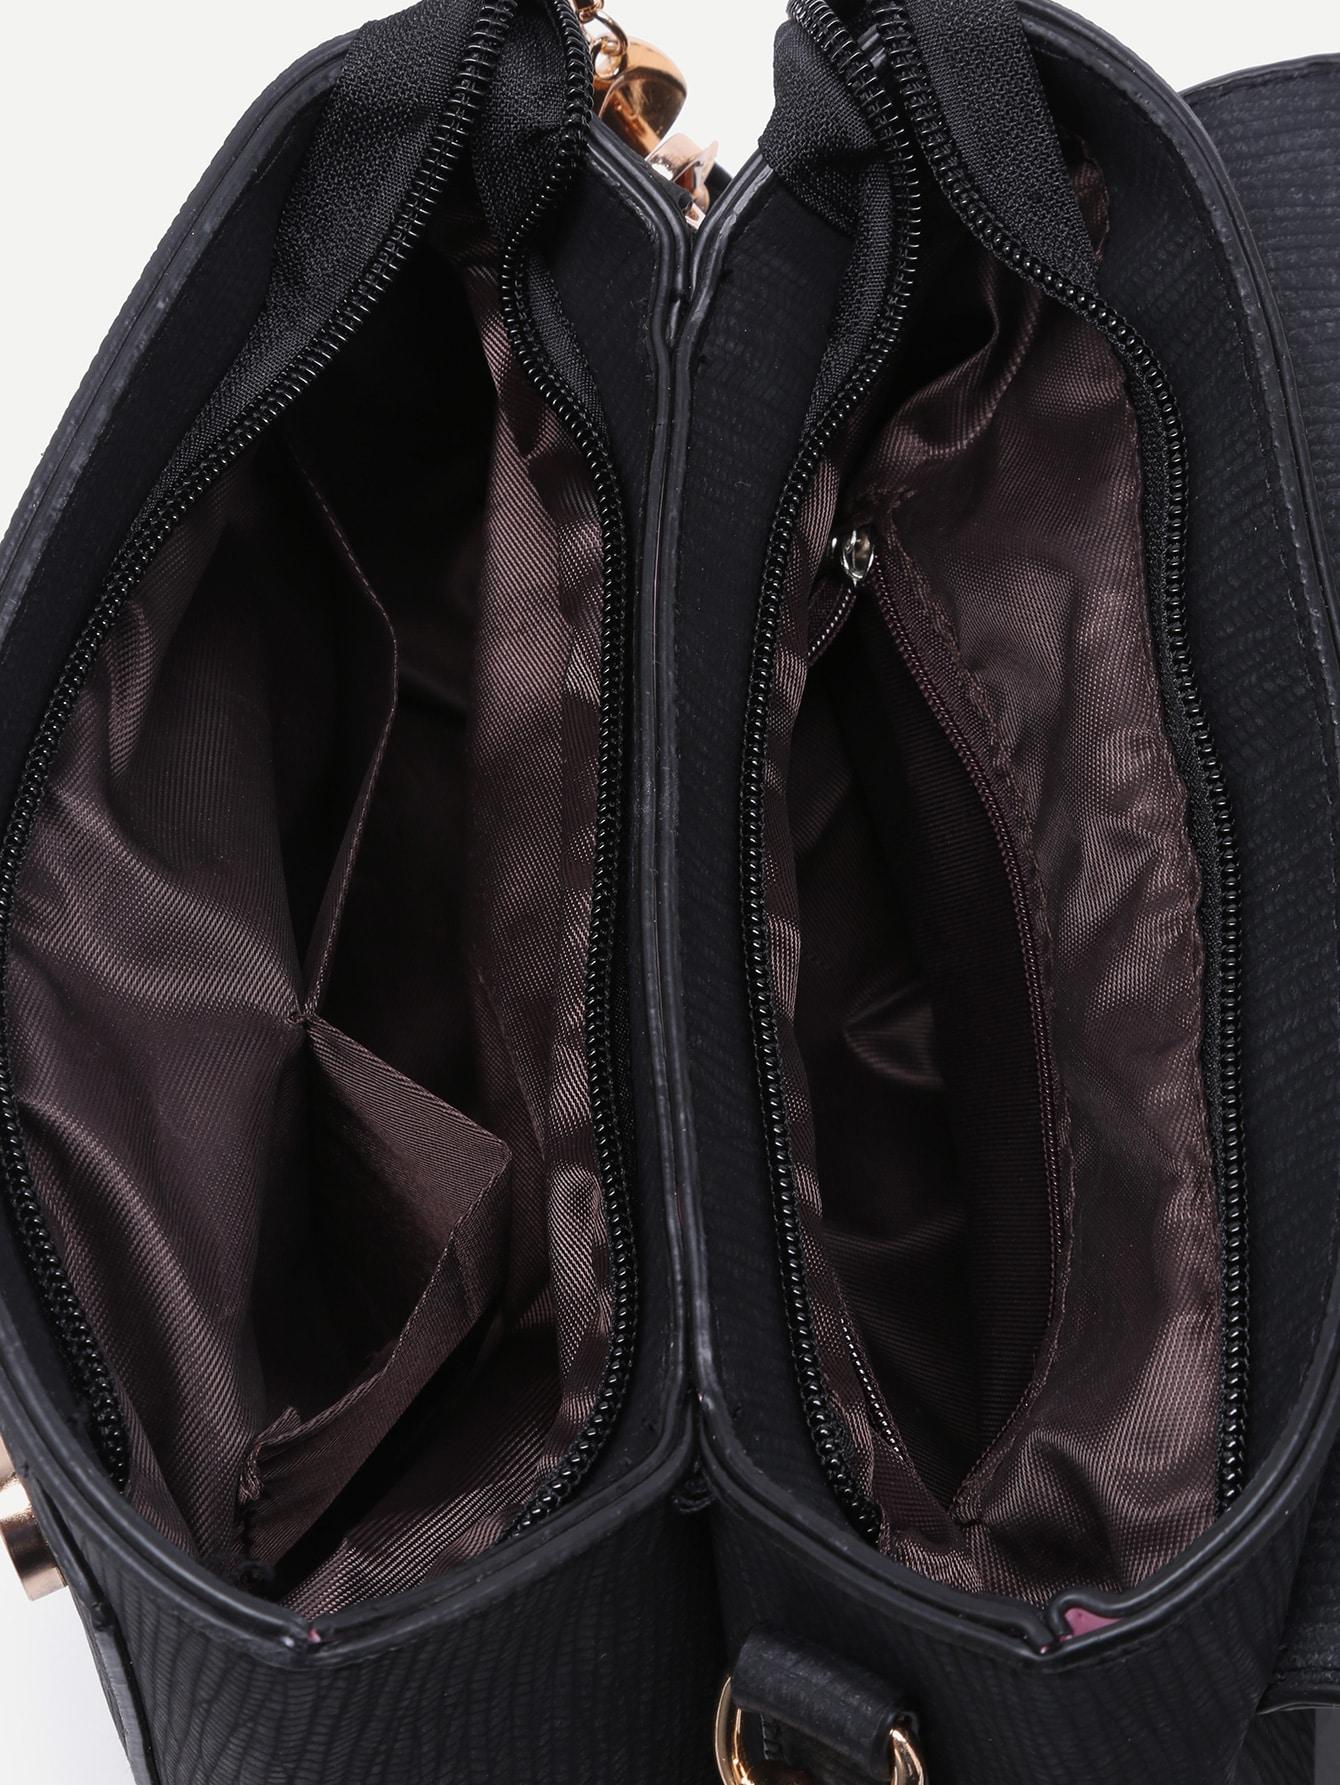 bag161031903_2